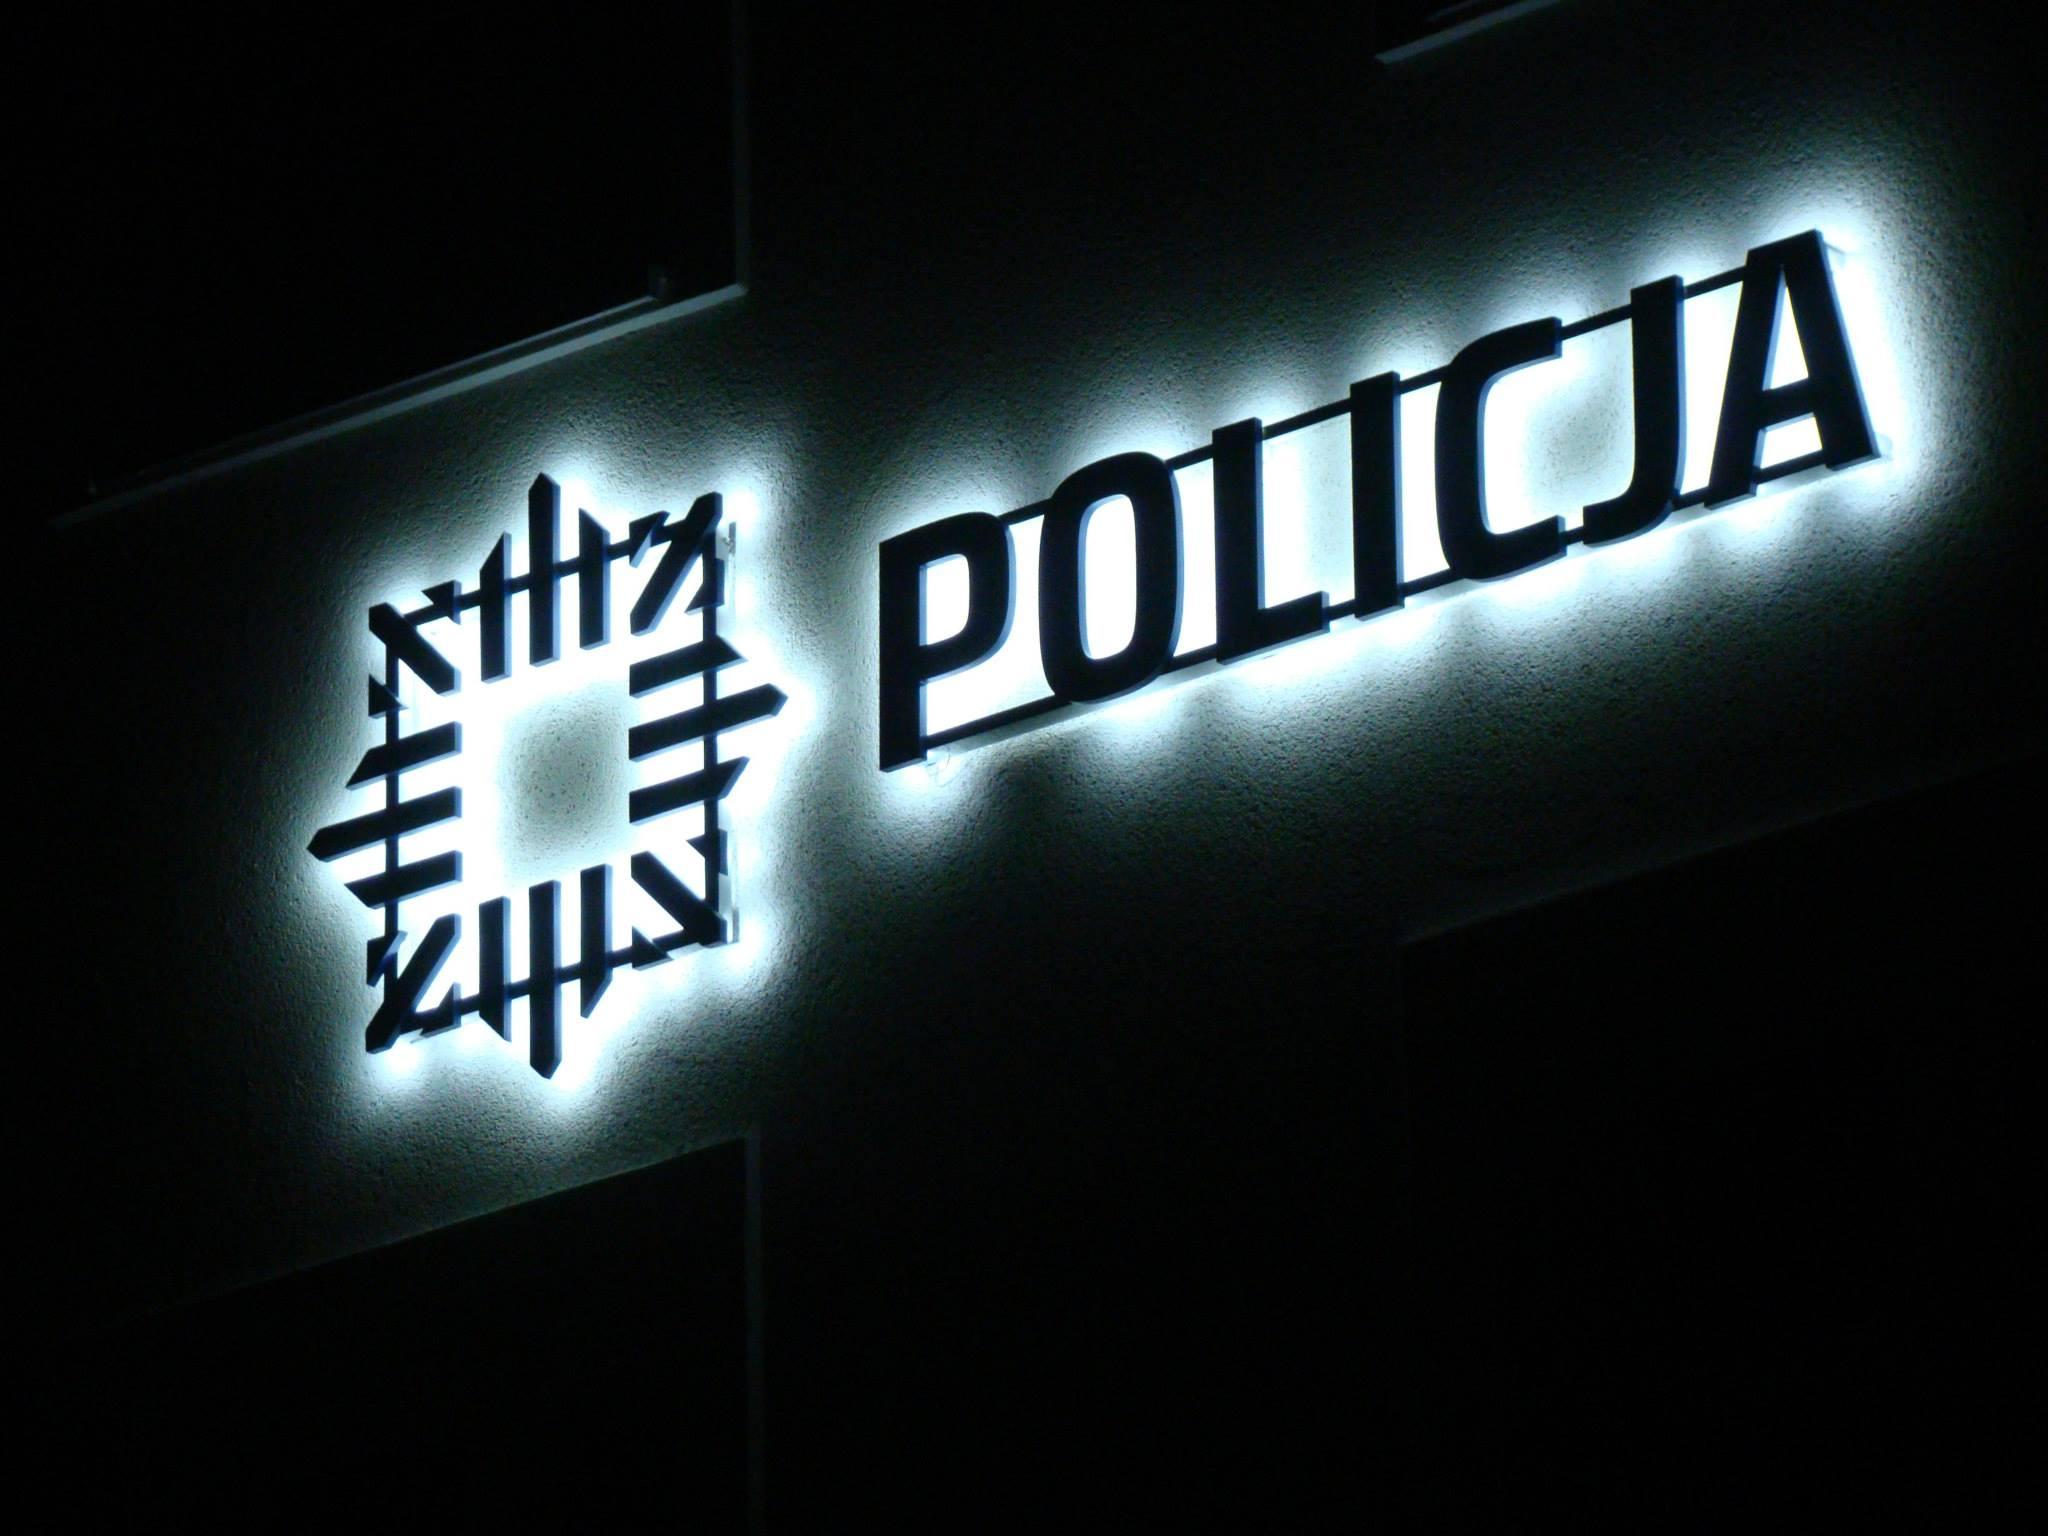 Logotyp logo 3D LED Policja PVC 19 mm efekt HALO